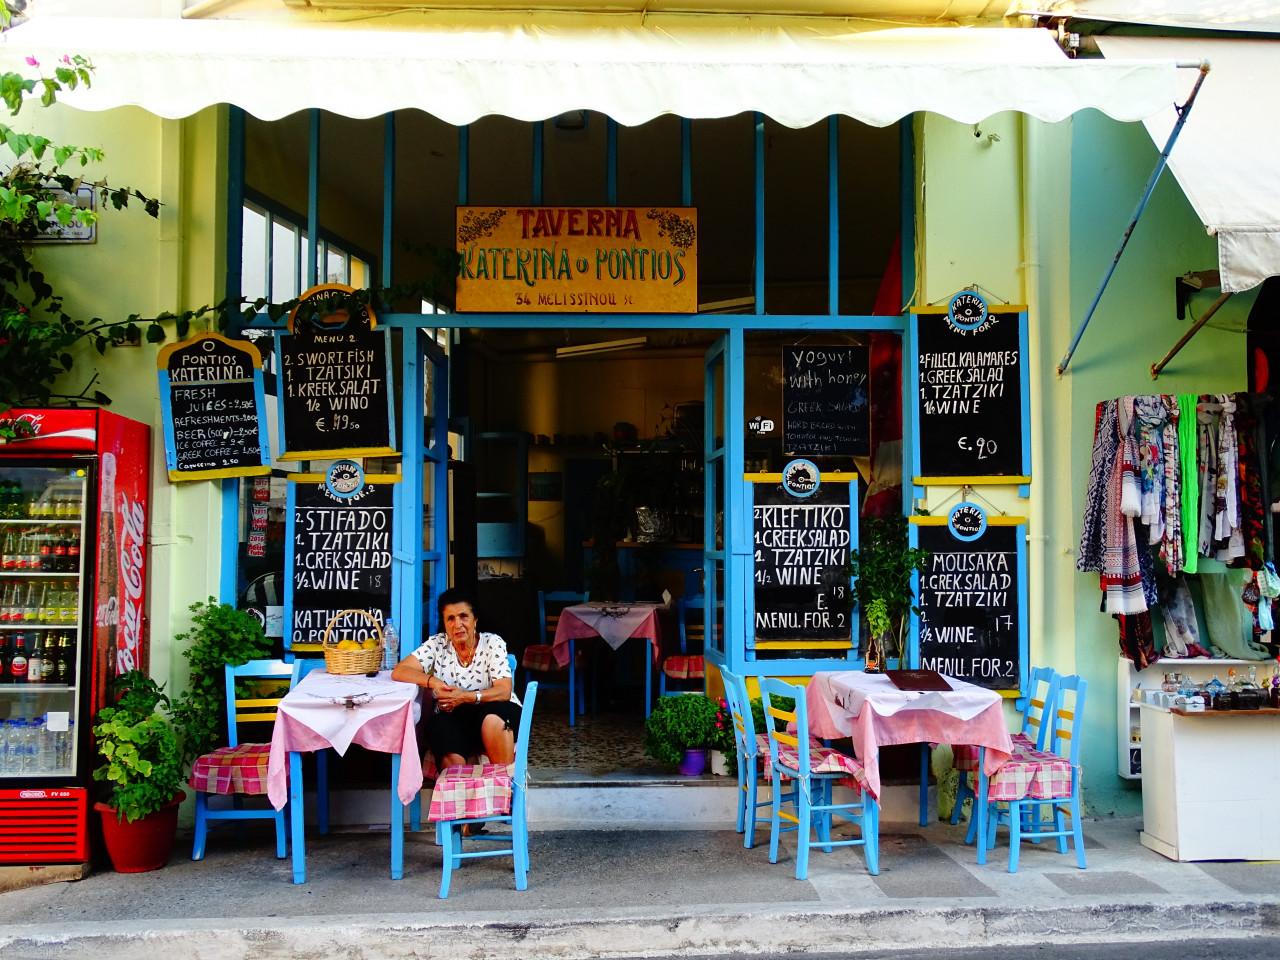 Une taverne traditionnelle. (© Pauline BOYER))